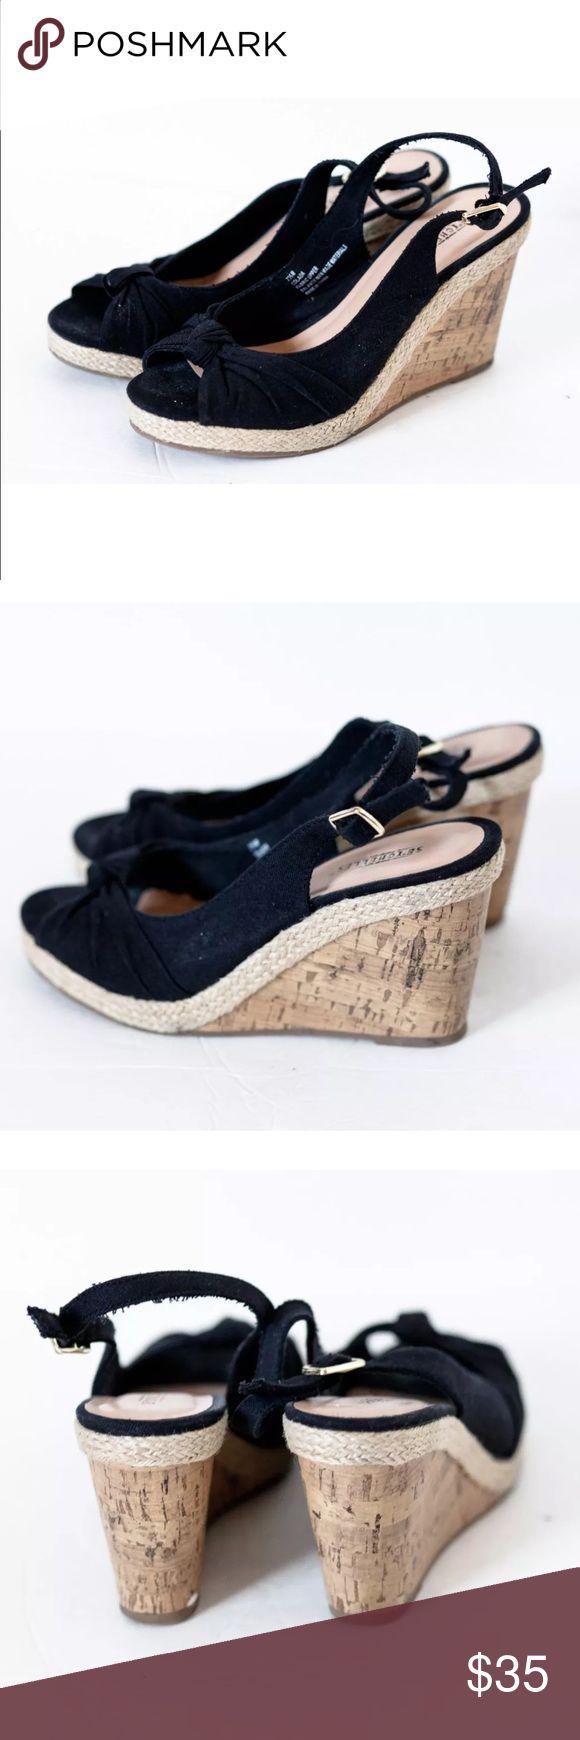 🆑Seychelles Colada Wedges Black Slingback Sandals Seychelles Colada Size 7.5M Women's Cork Wedges Black Canvas Slingback Sandals Seychelles Shoes Wedges